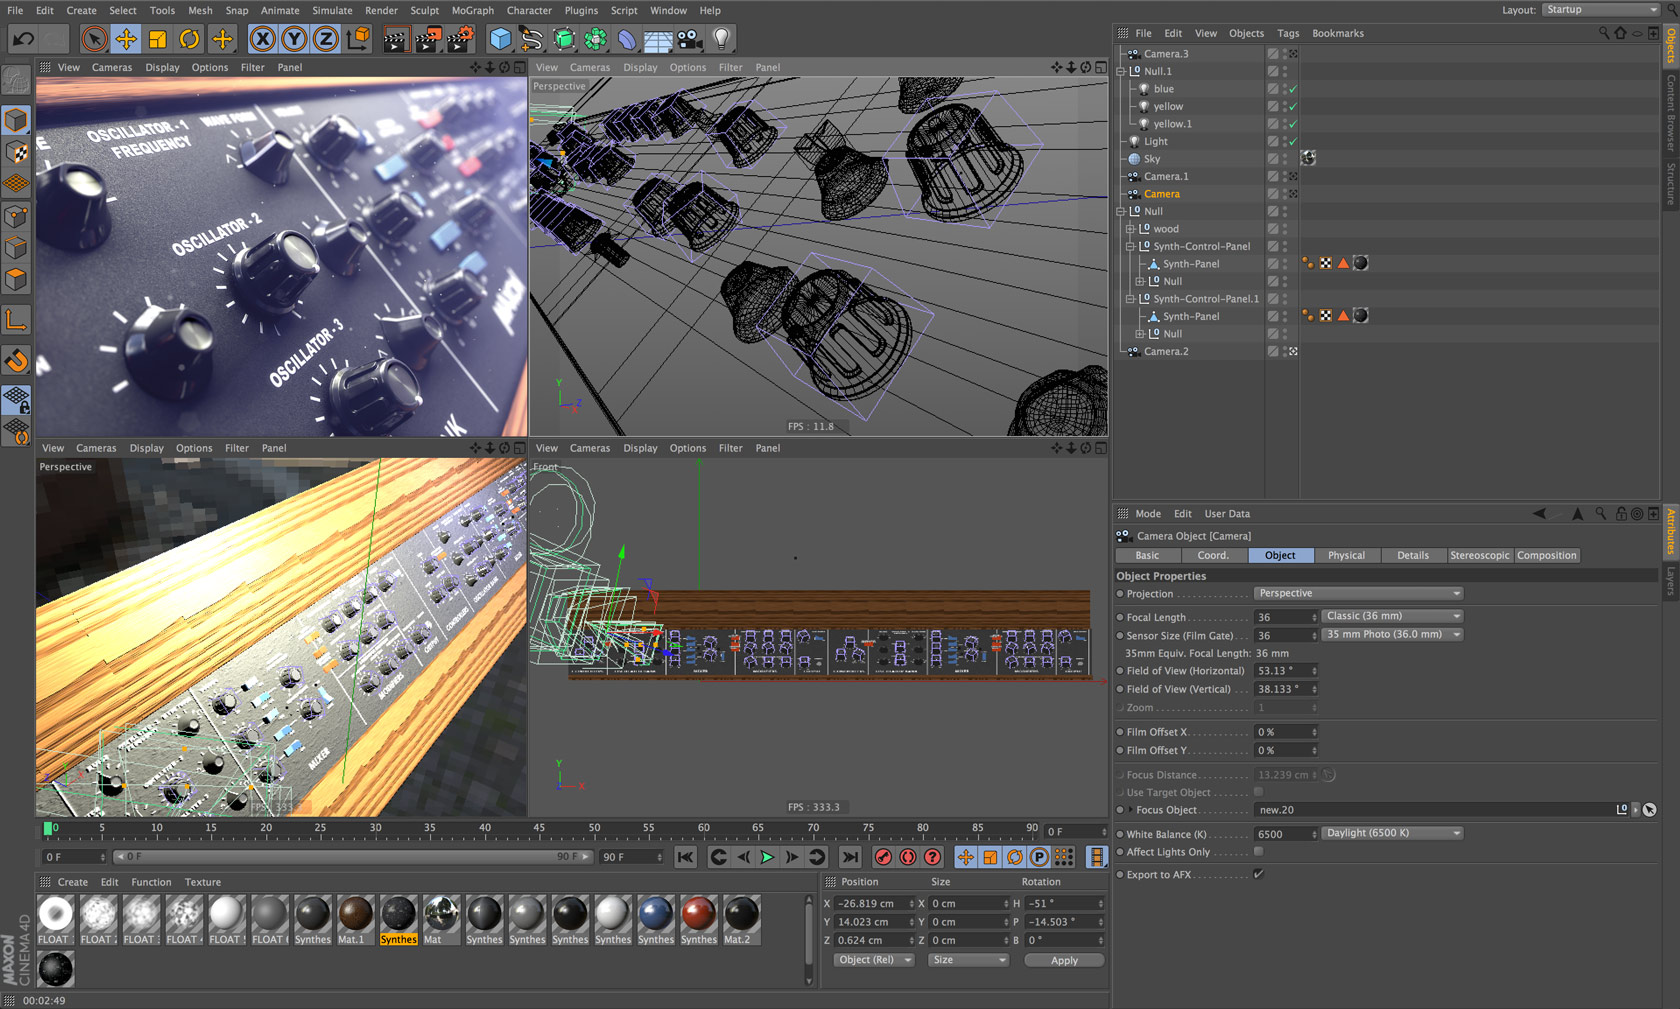 Cinema 4D Studio 2020 Crack